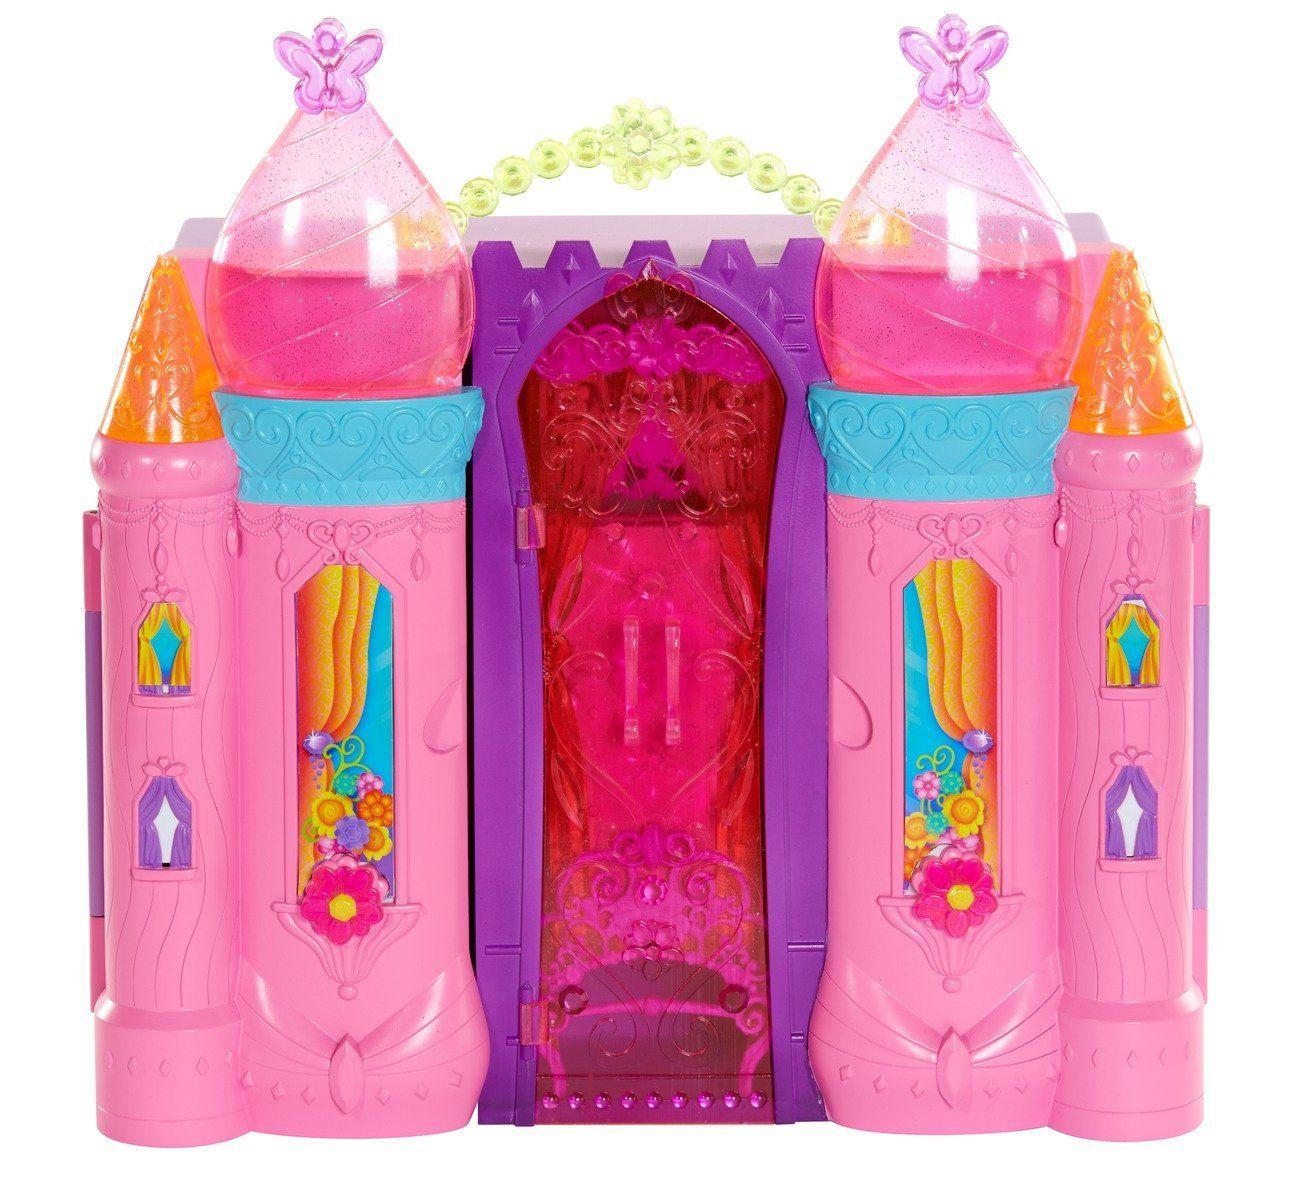 Barbie - Castillo de la Puerta Secreta, 76 x 32 cm (Mattel ...